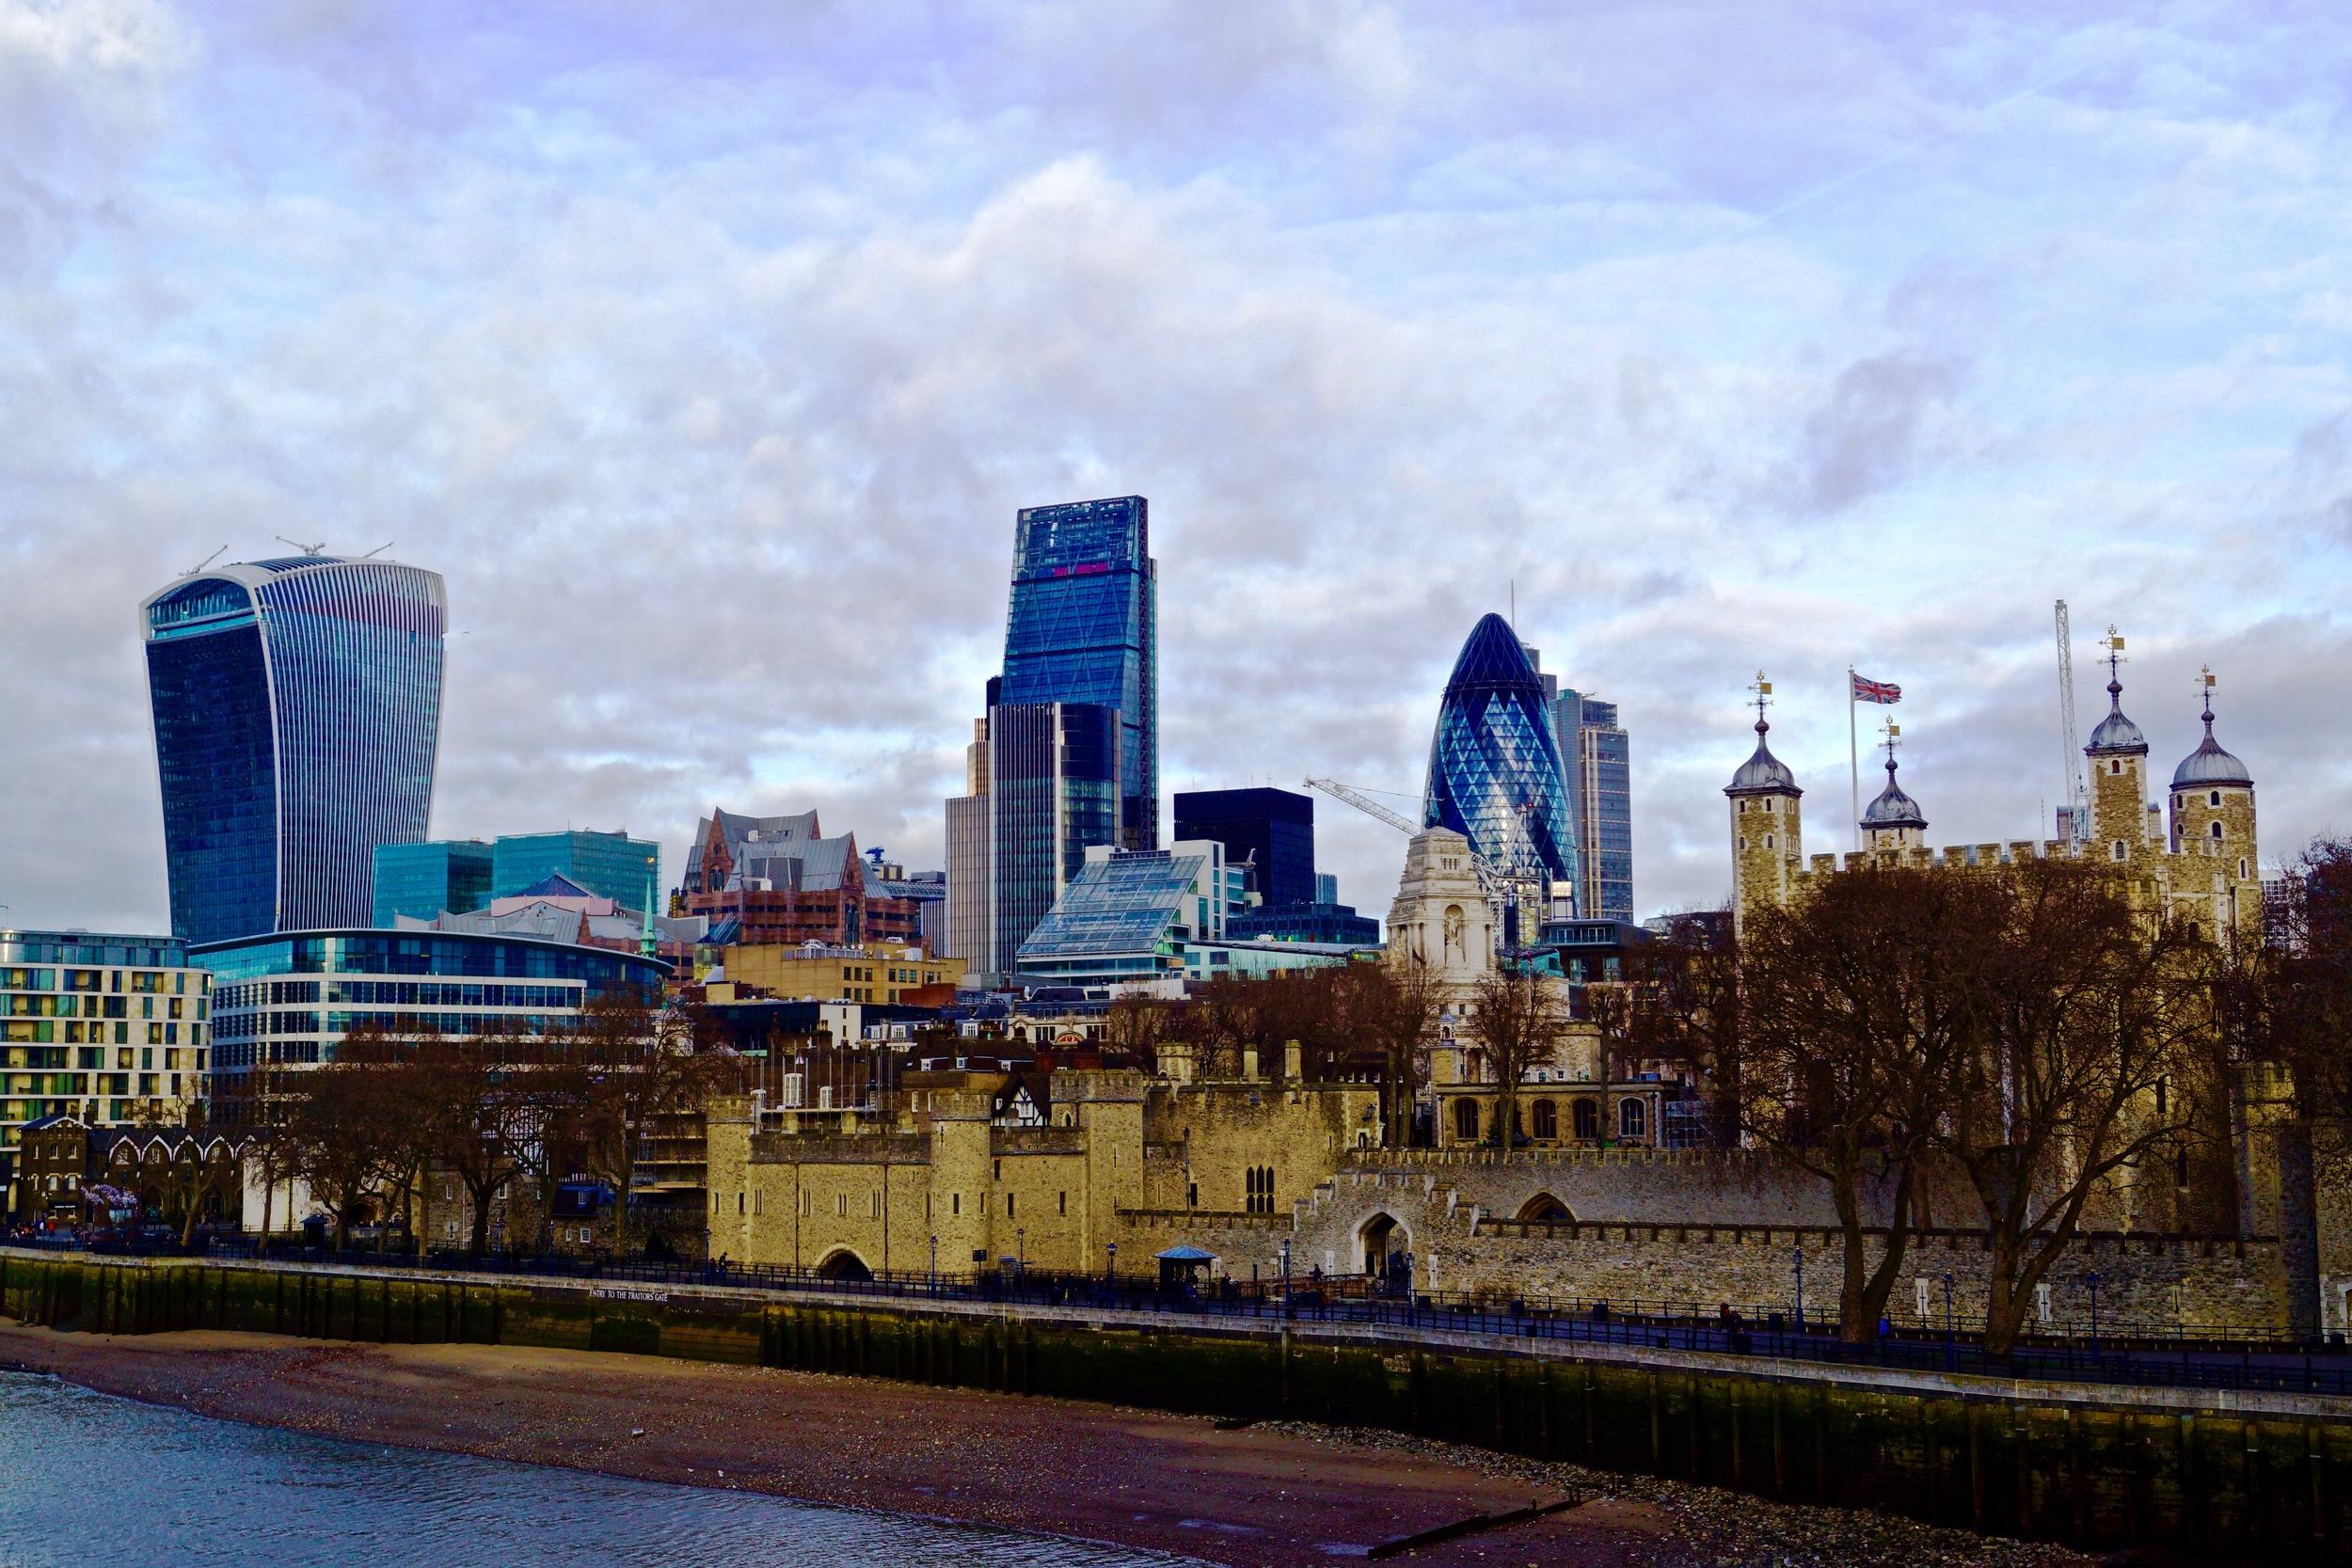 London, December 2014